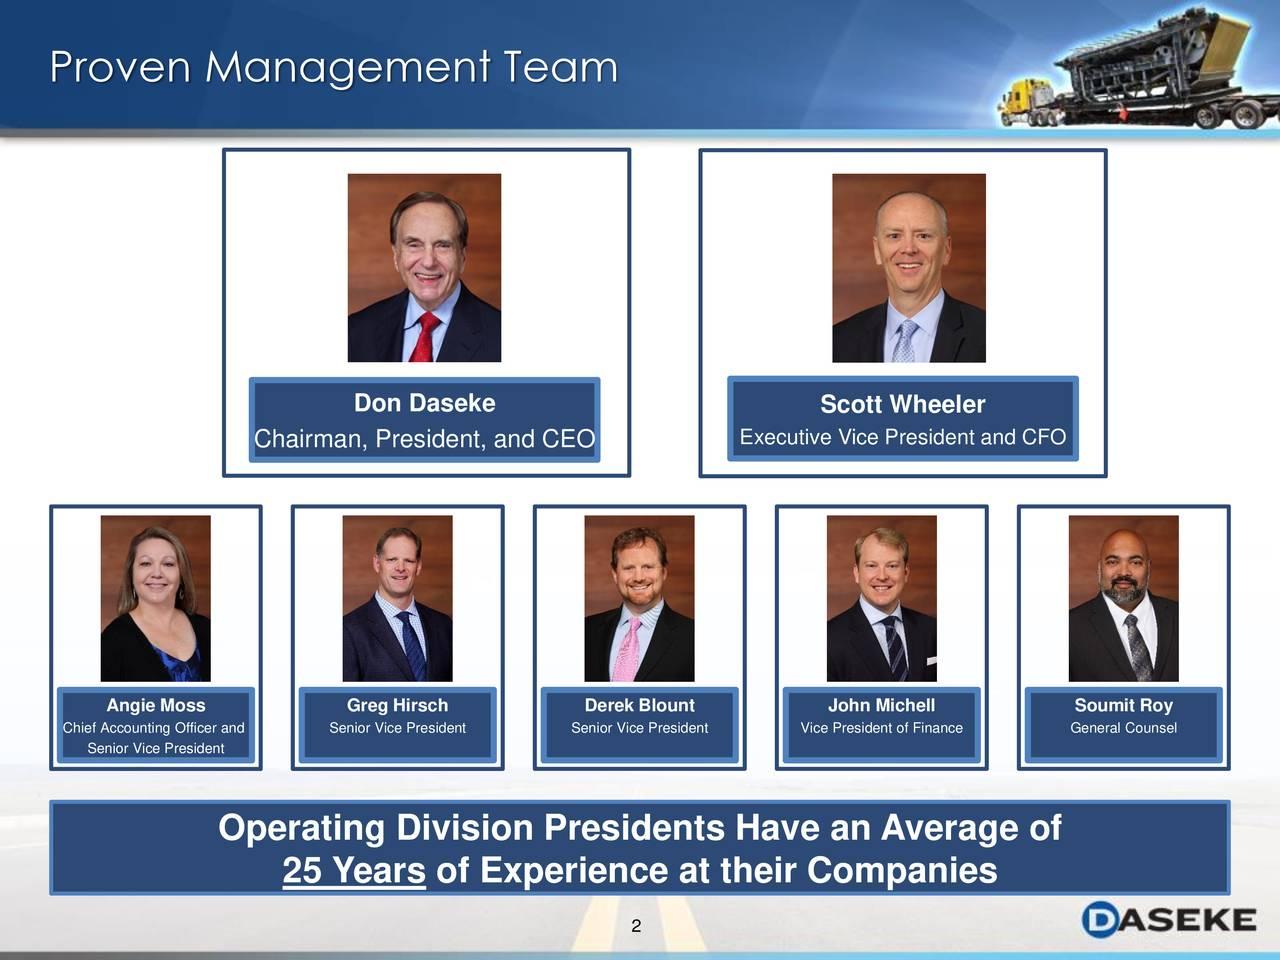 Proven Management Team